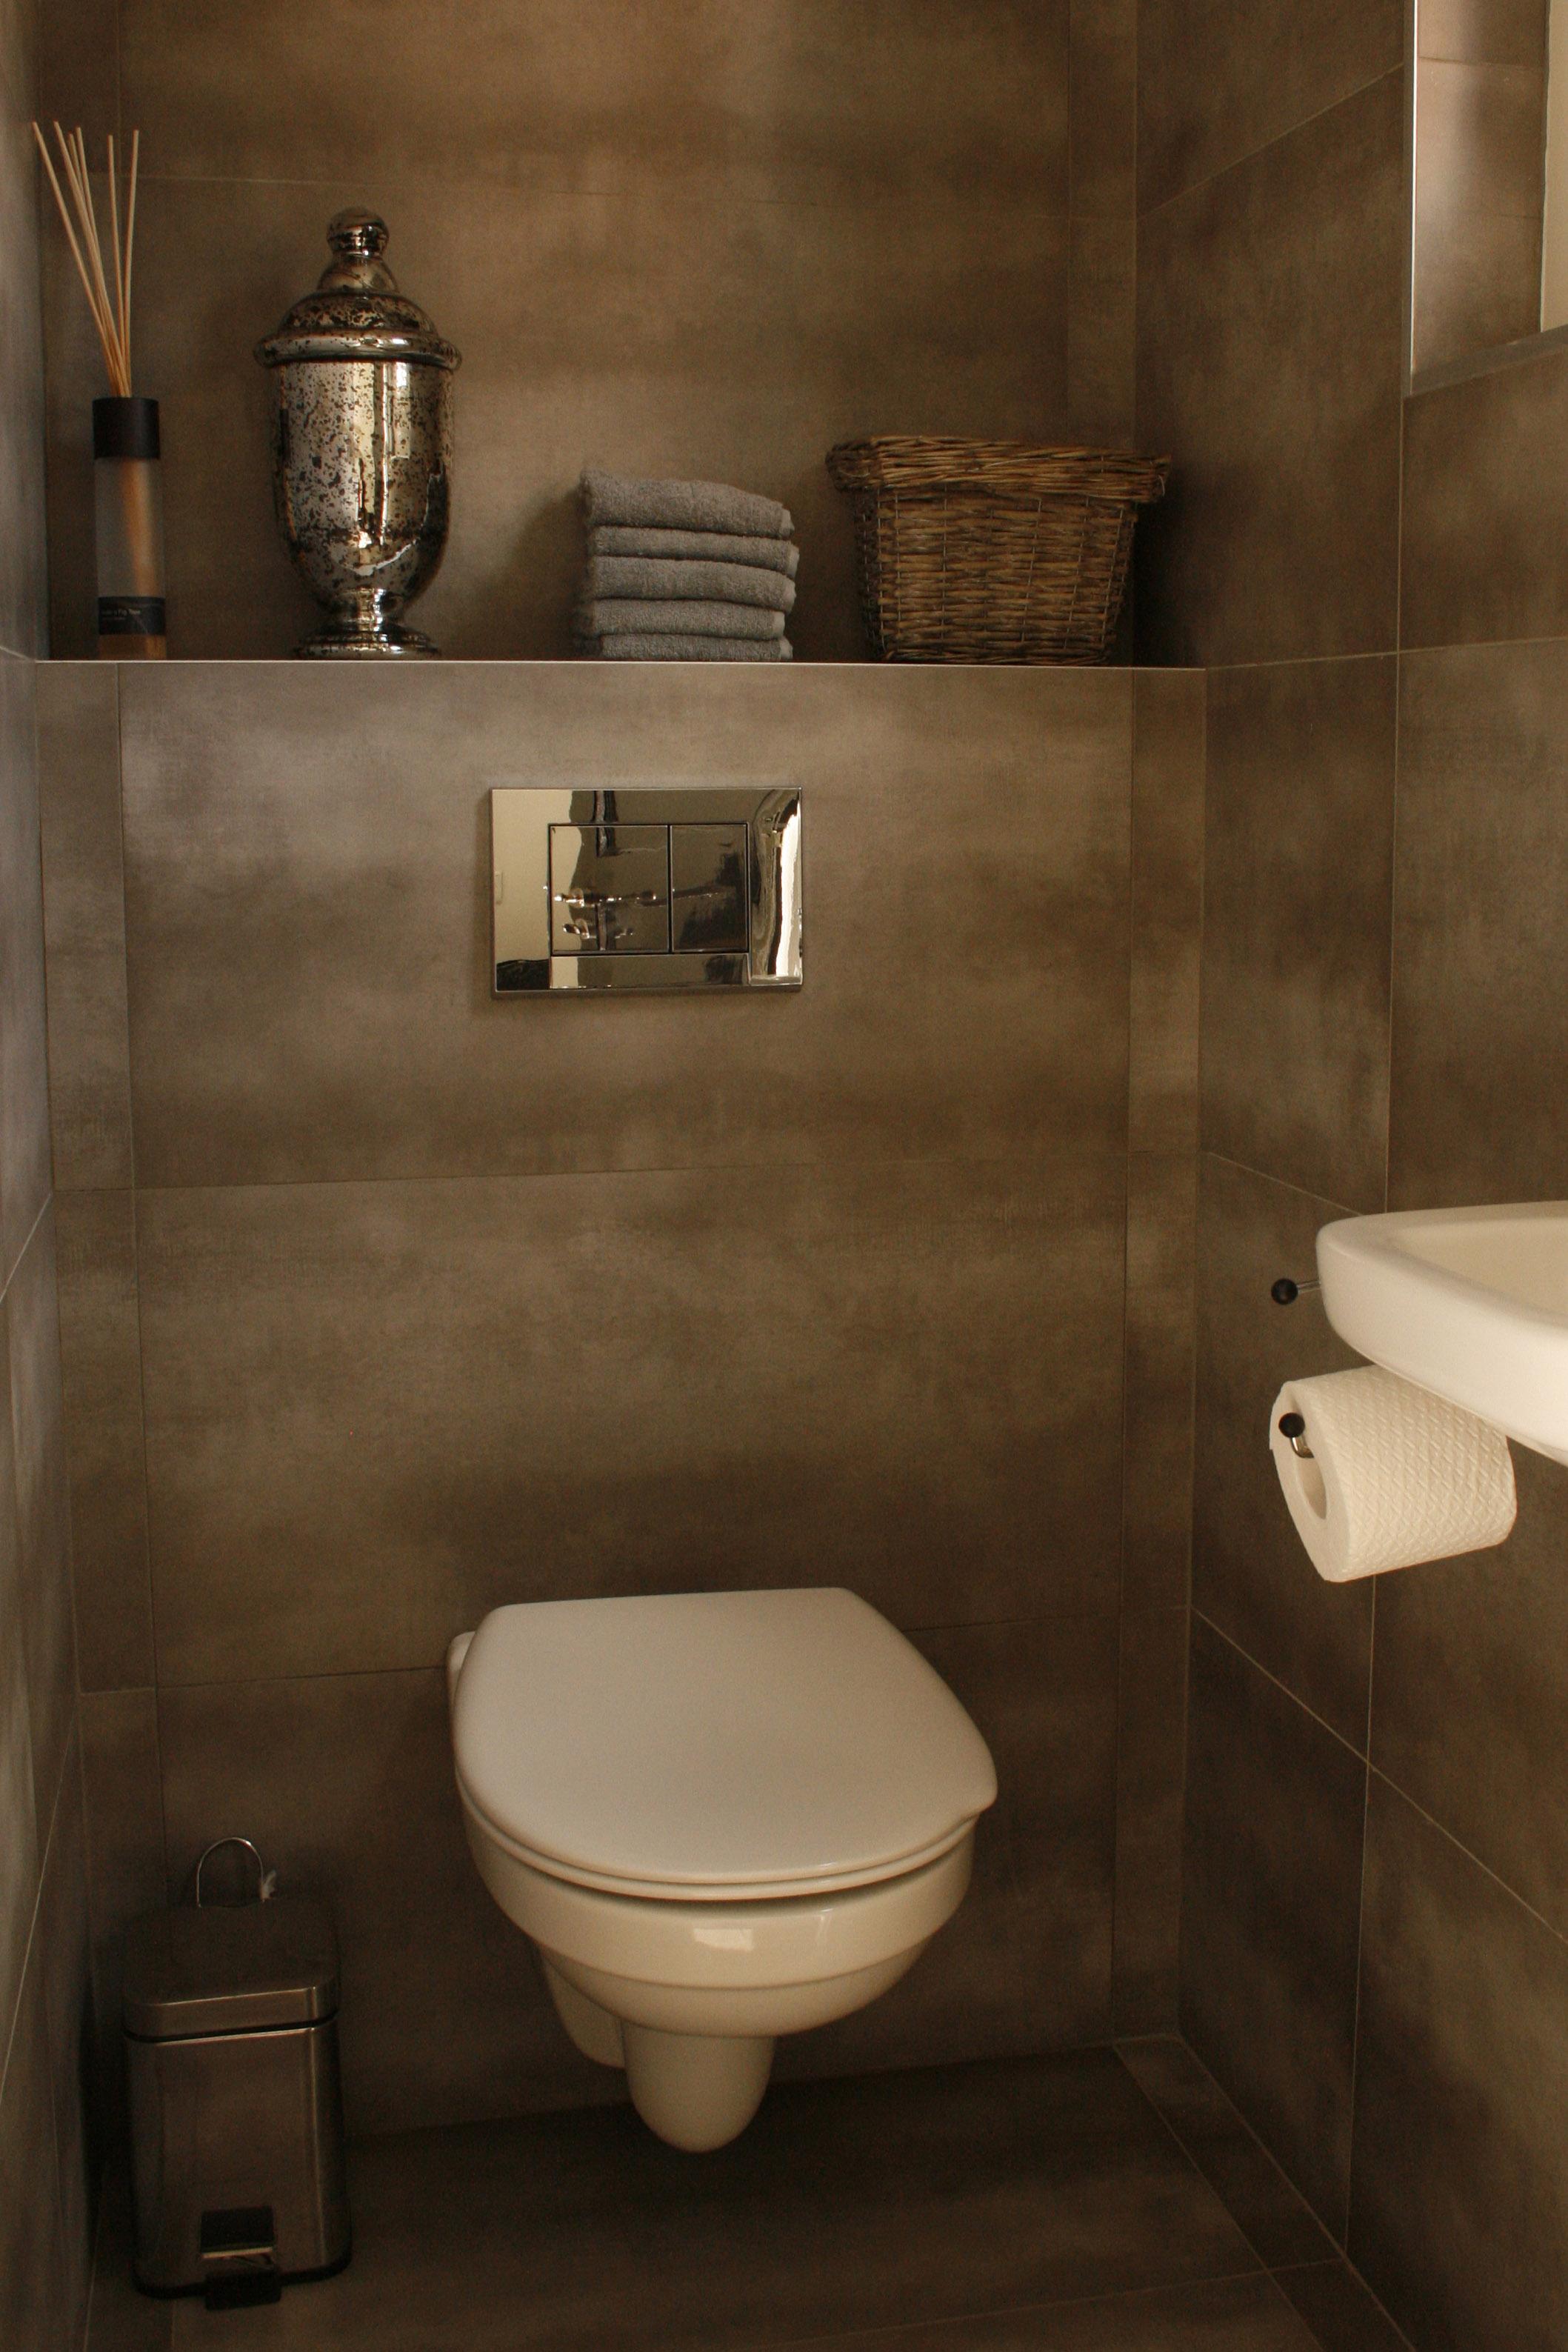 Tegelwerk badkamer particulier woonhuis baarlo - Badkamer keramische foto ...